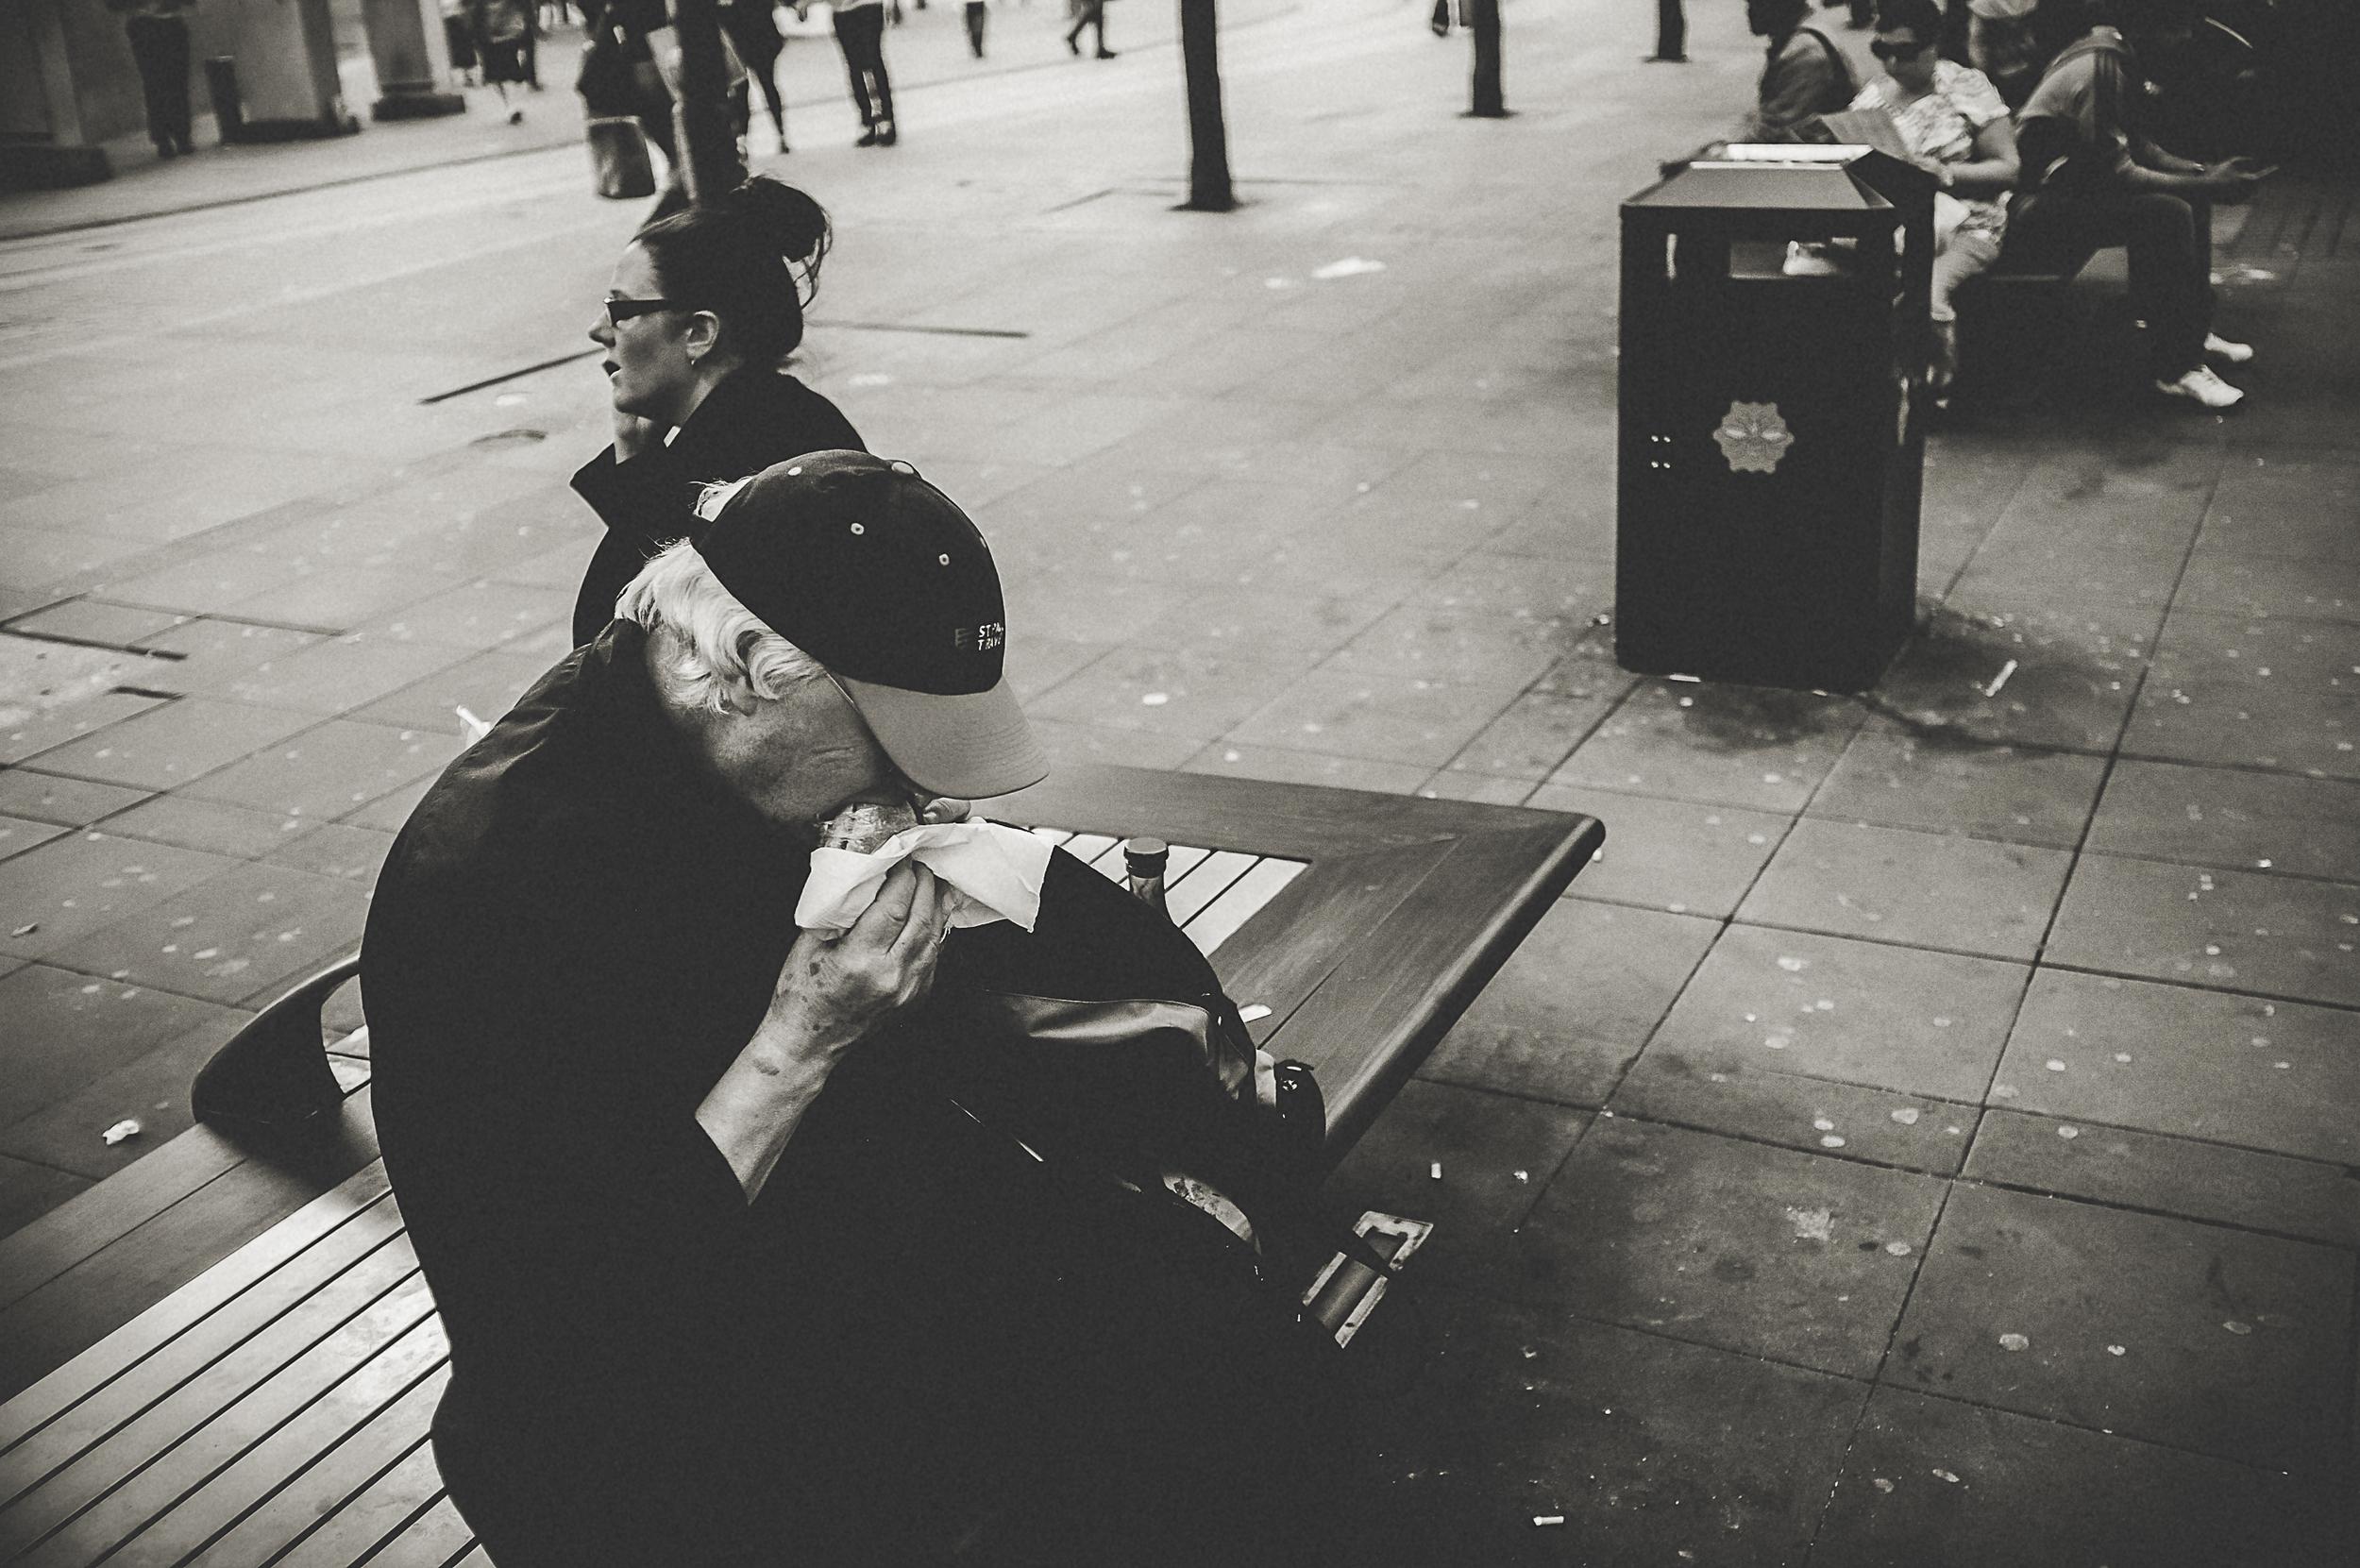 street_photography_fuji_x100-6.jpg